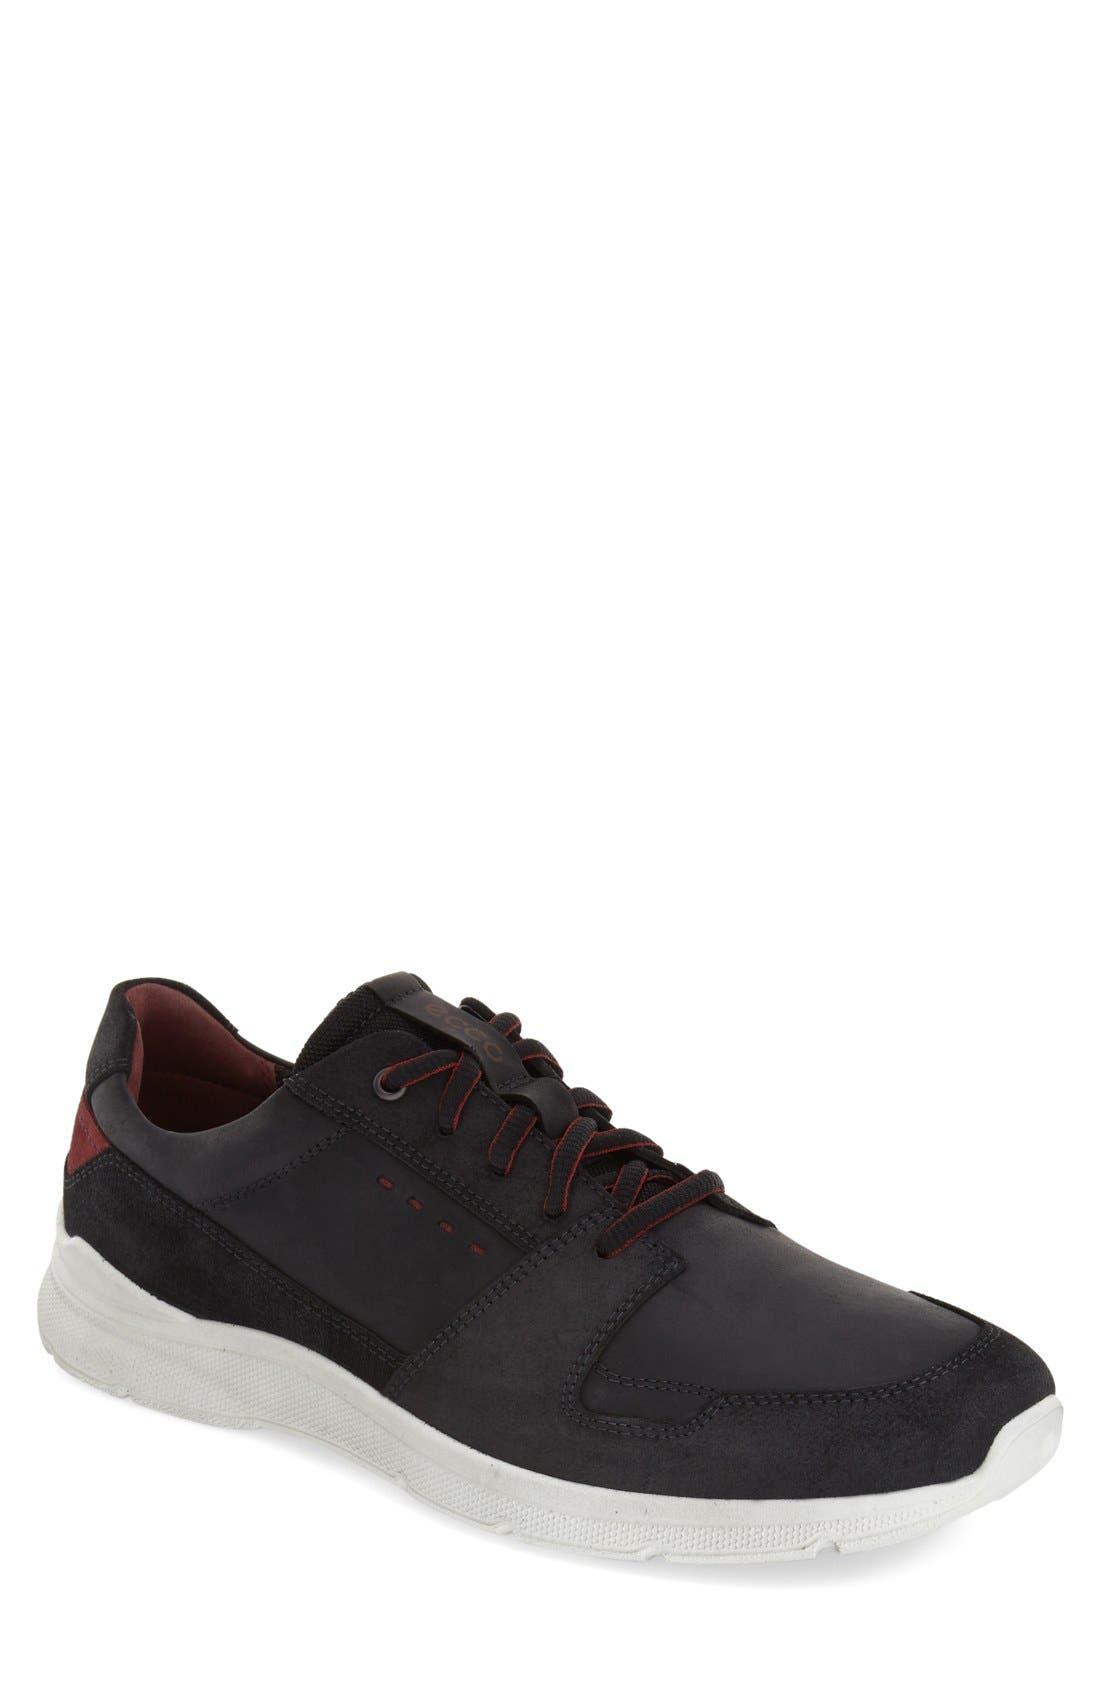 Alternate Image 1 Selected - ECCO 'Irondale - Retro' Sneaker (Men)